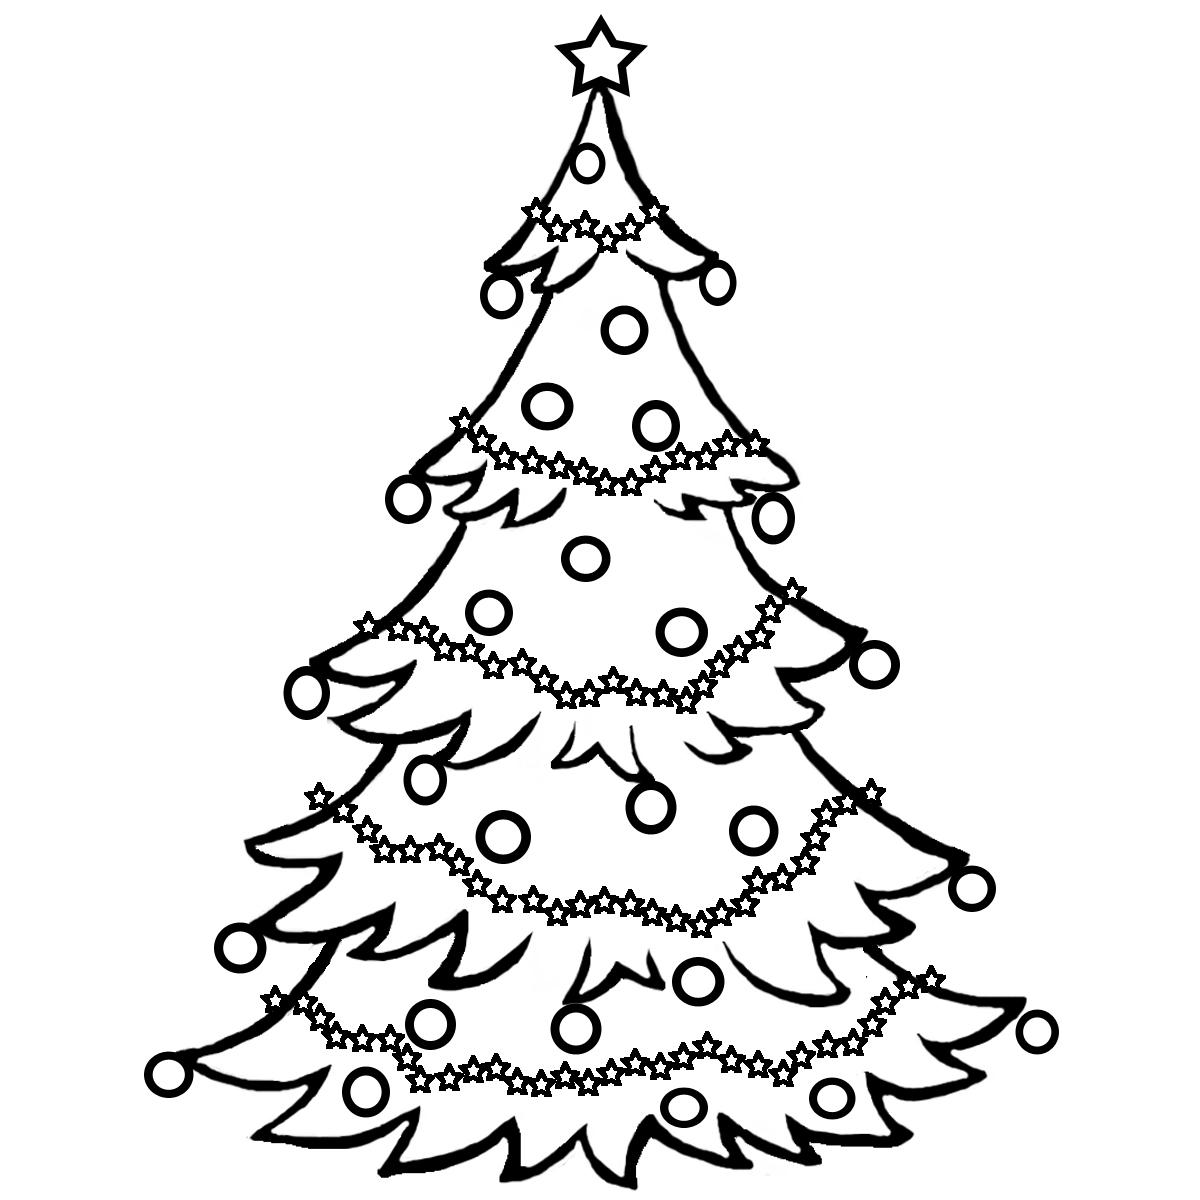 1200x1200 Drawings Of A Christmas Tree Christmas Tree Line Drawing Free